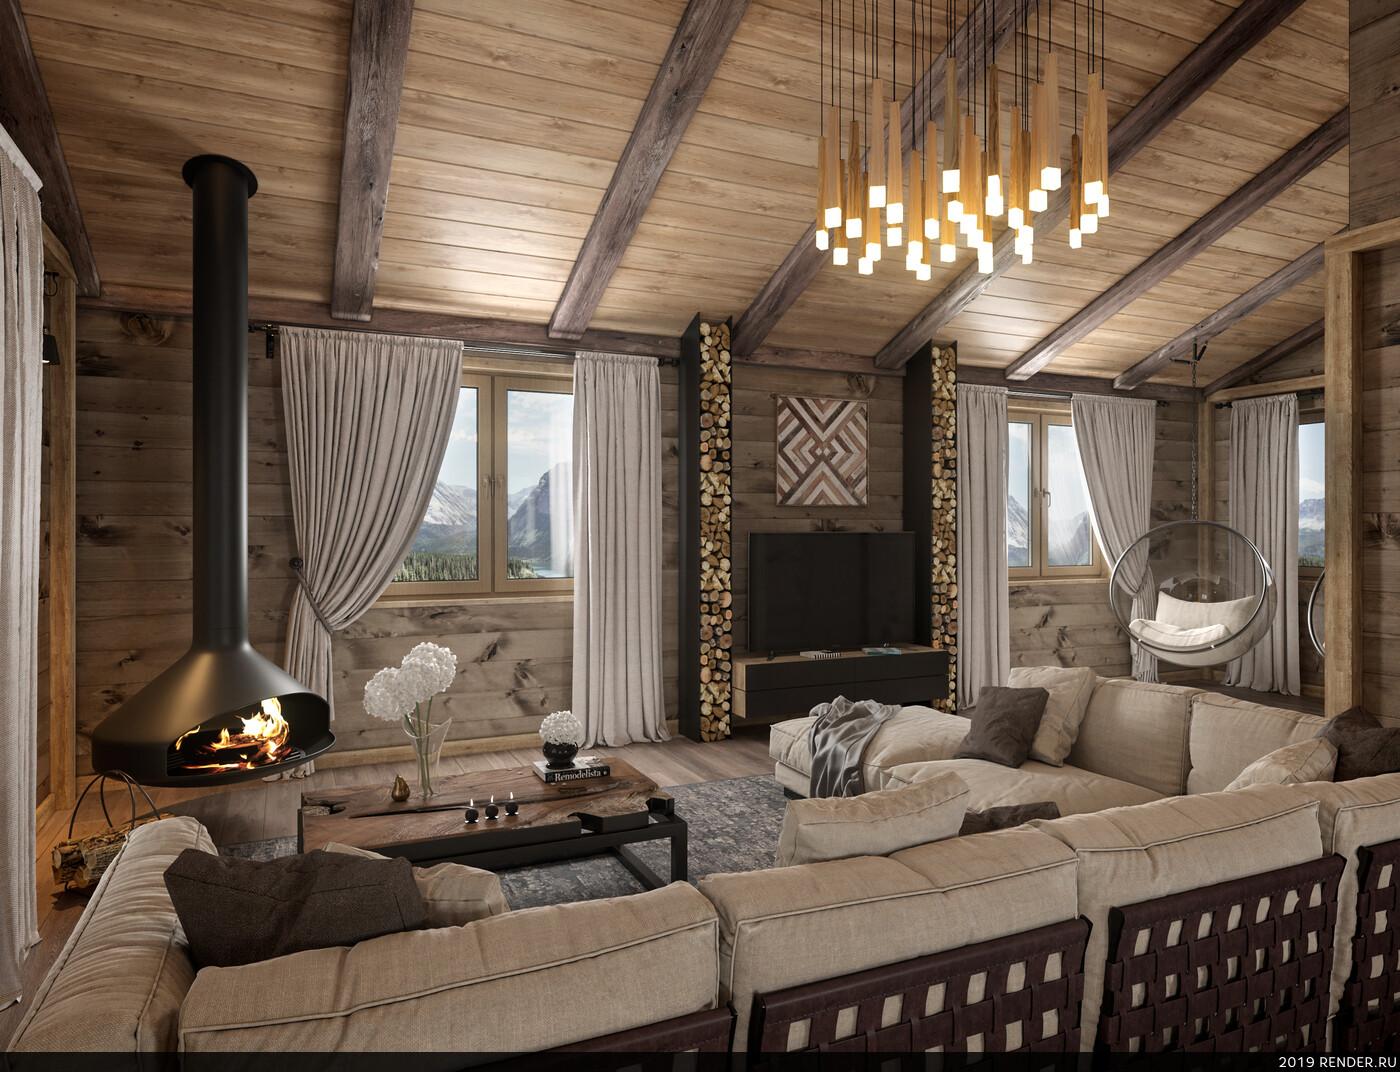 corona, Corona Renderer, interior design, interior, moderm interior, designer, 3ds max, cgart, architecture